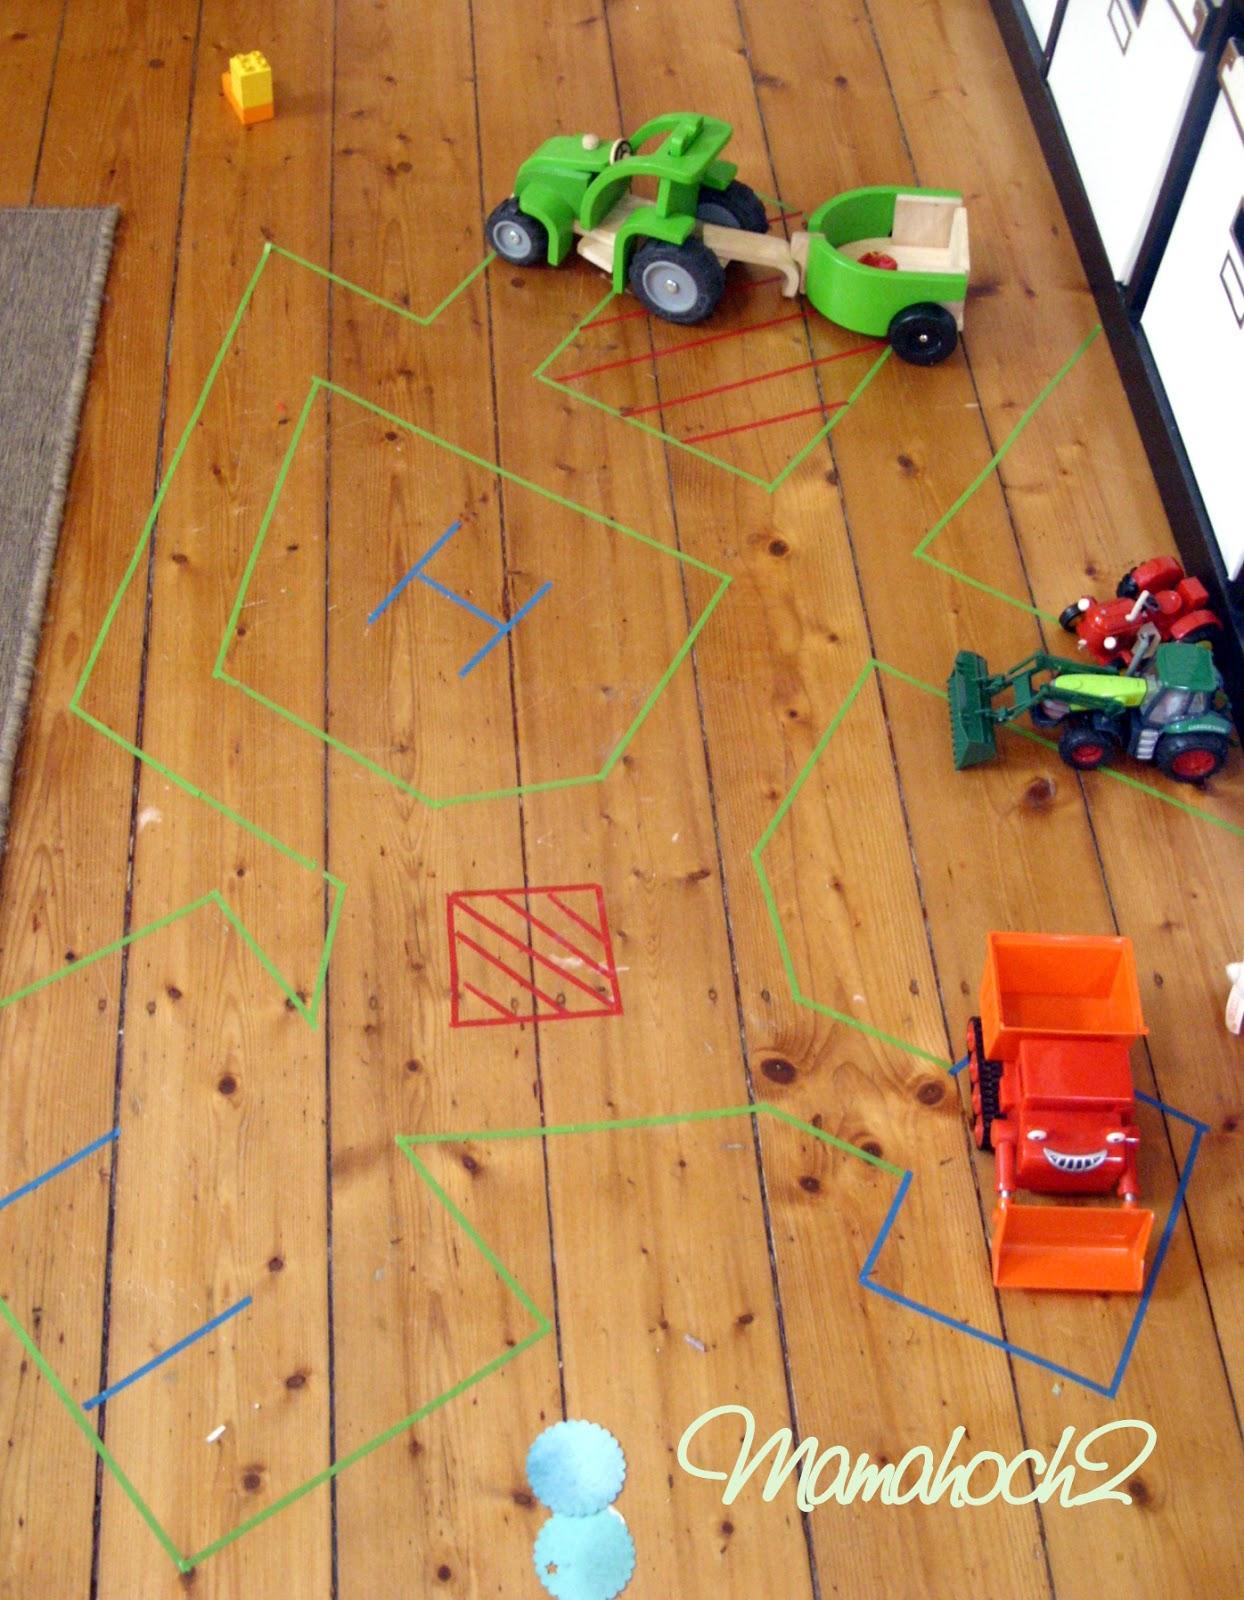 masking tape ideen 5 kinderzimmer mamahoch2. Black Bedroom Furniture Sets. Home Design Ideas